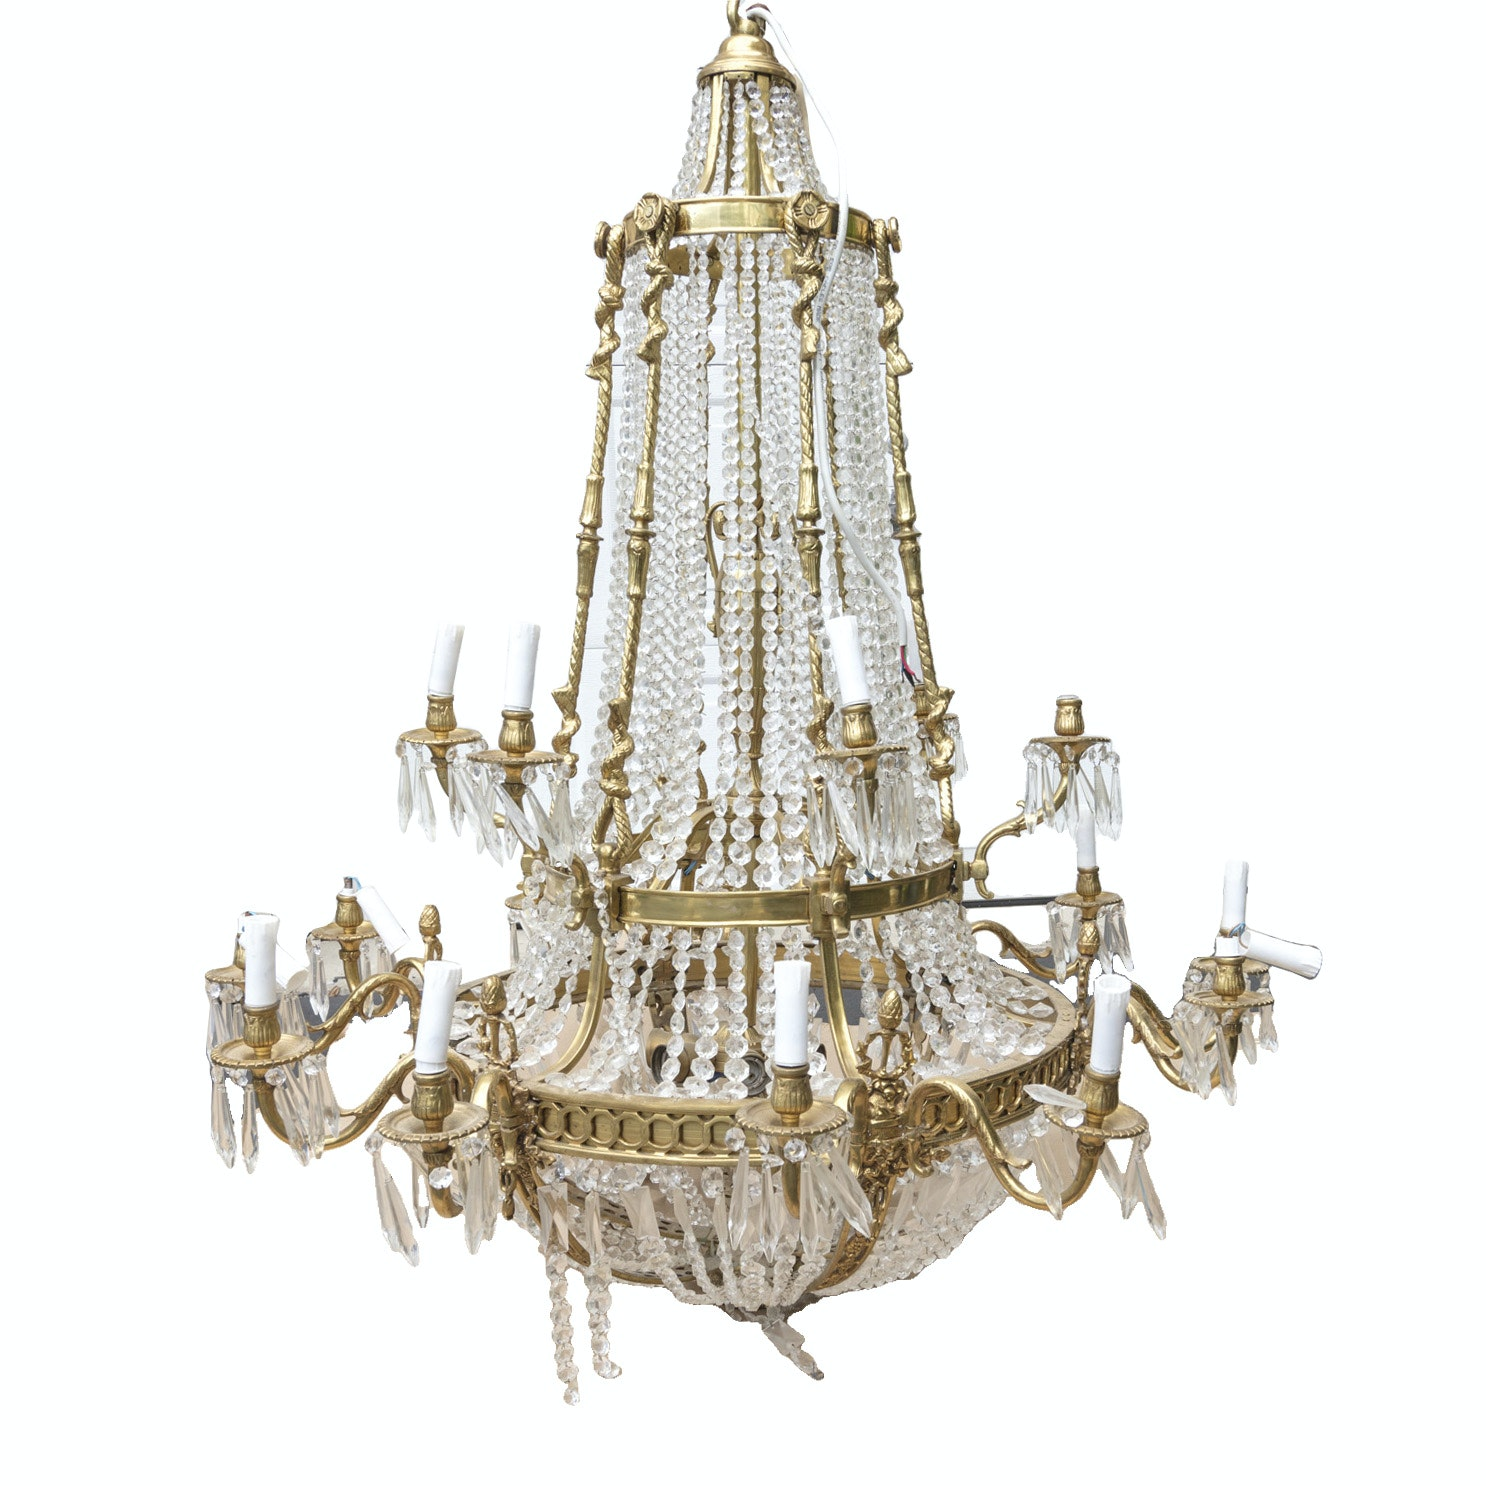 Vintage Ornate Brass and Crystal Chandelier